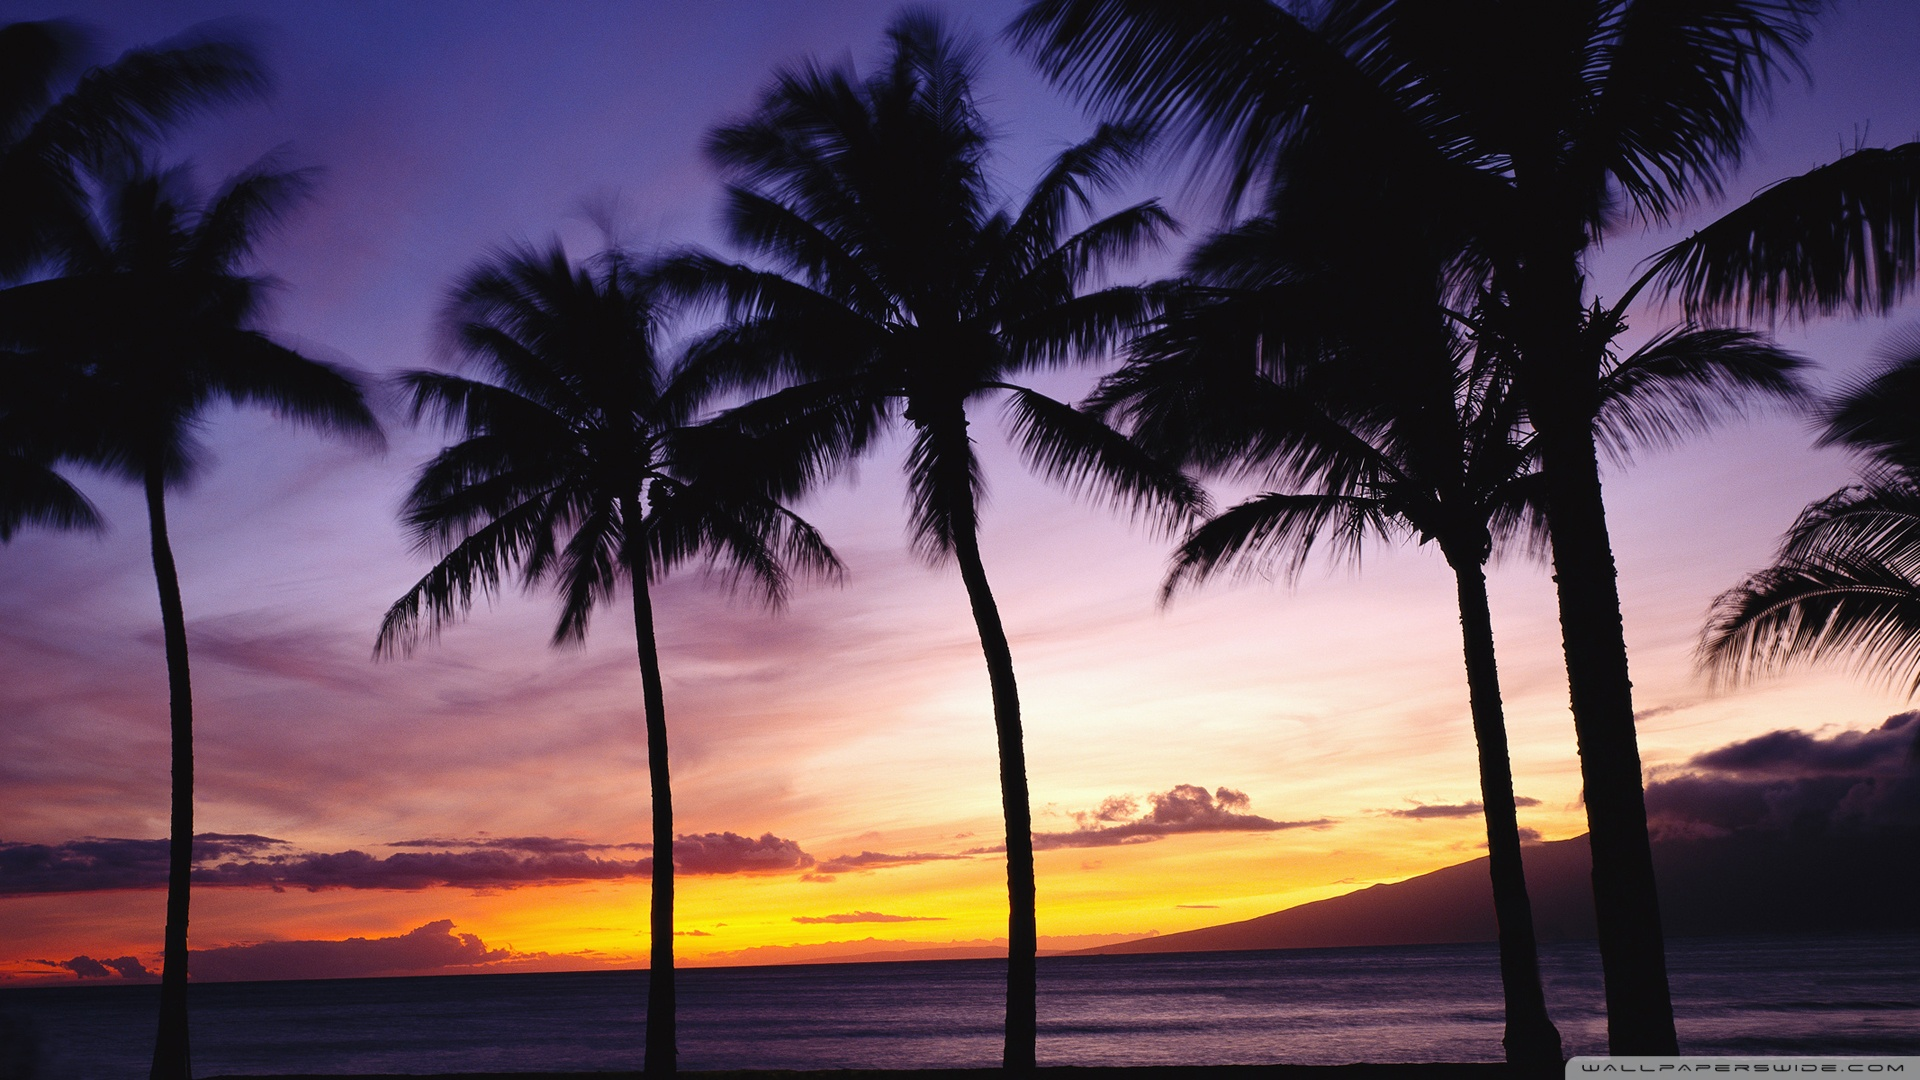 Palm Tree Sunset Wallpaper Hd Background 9 HD Wallpapersjpg Palm 1920x1080